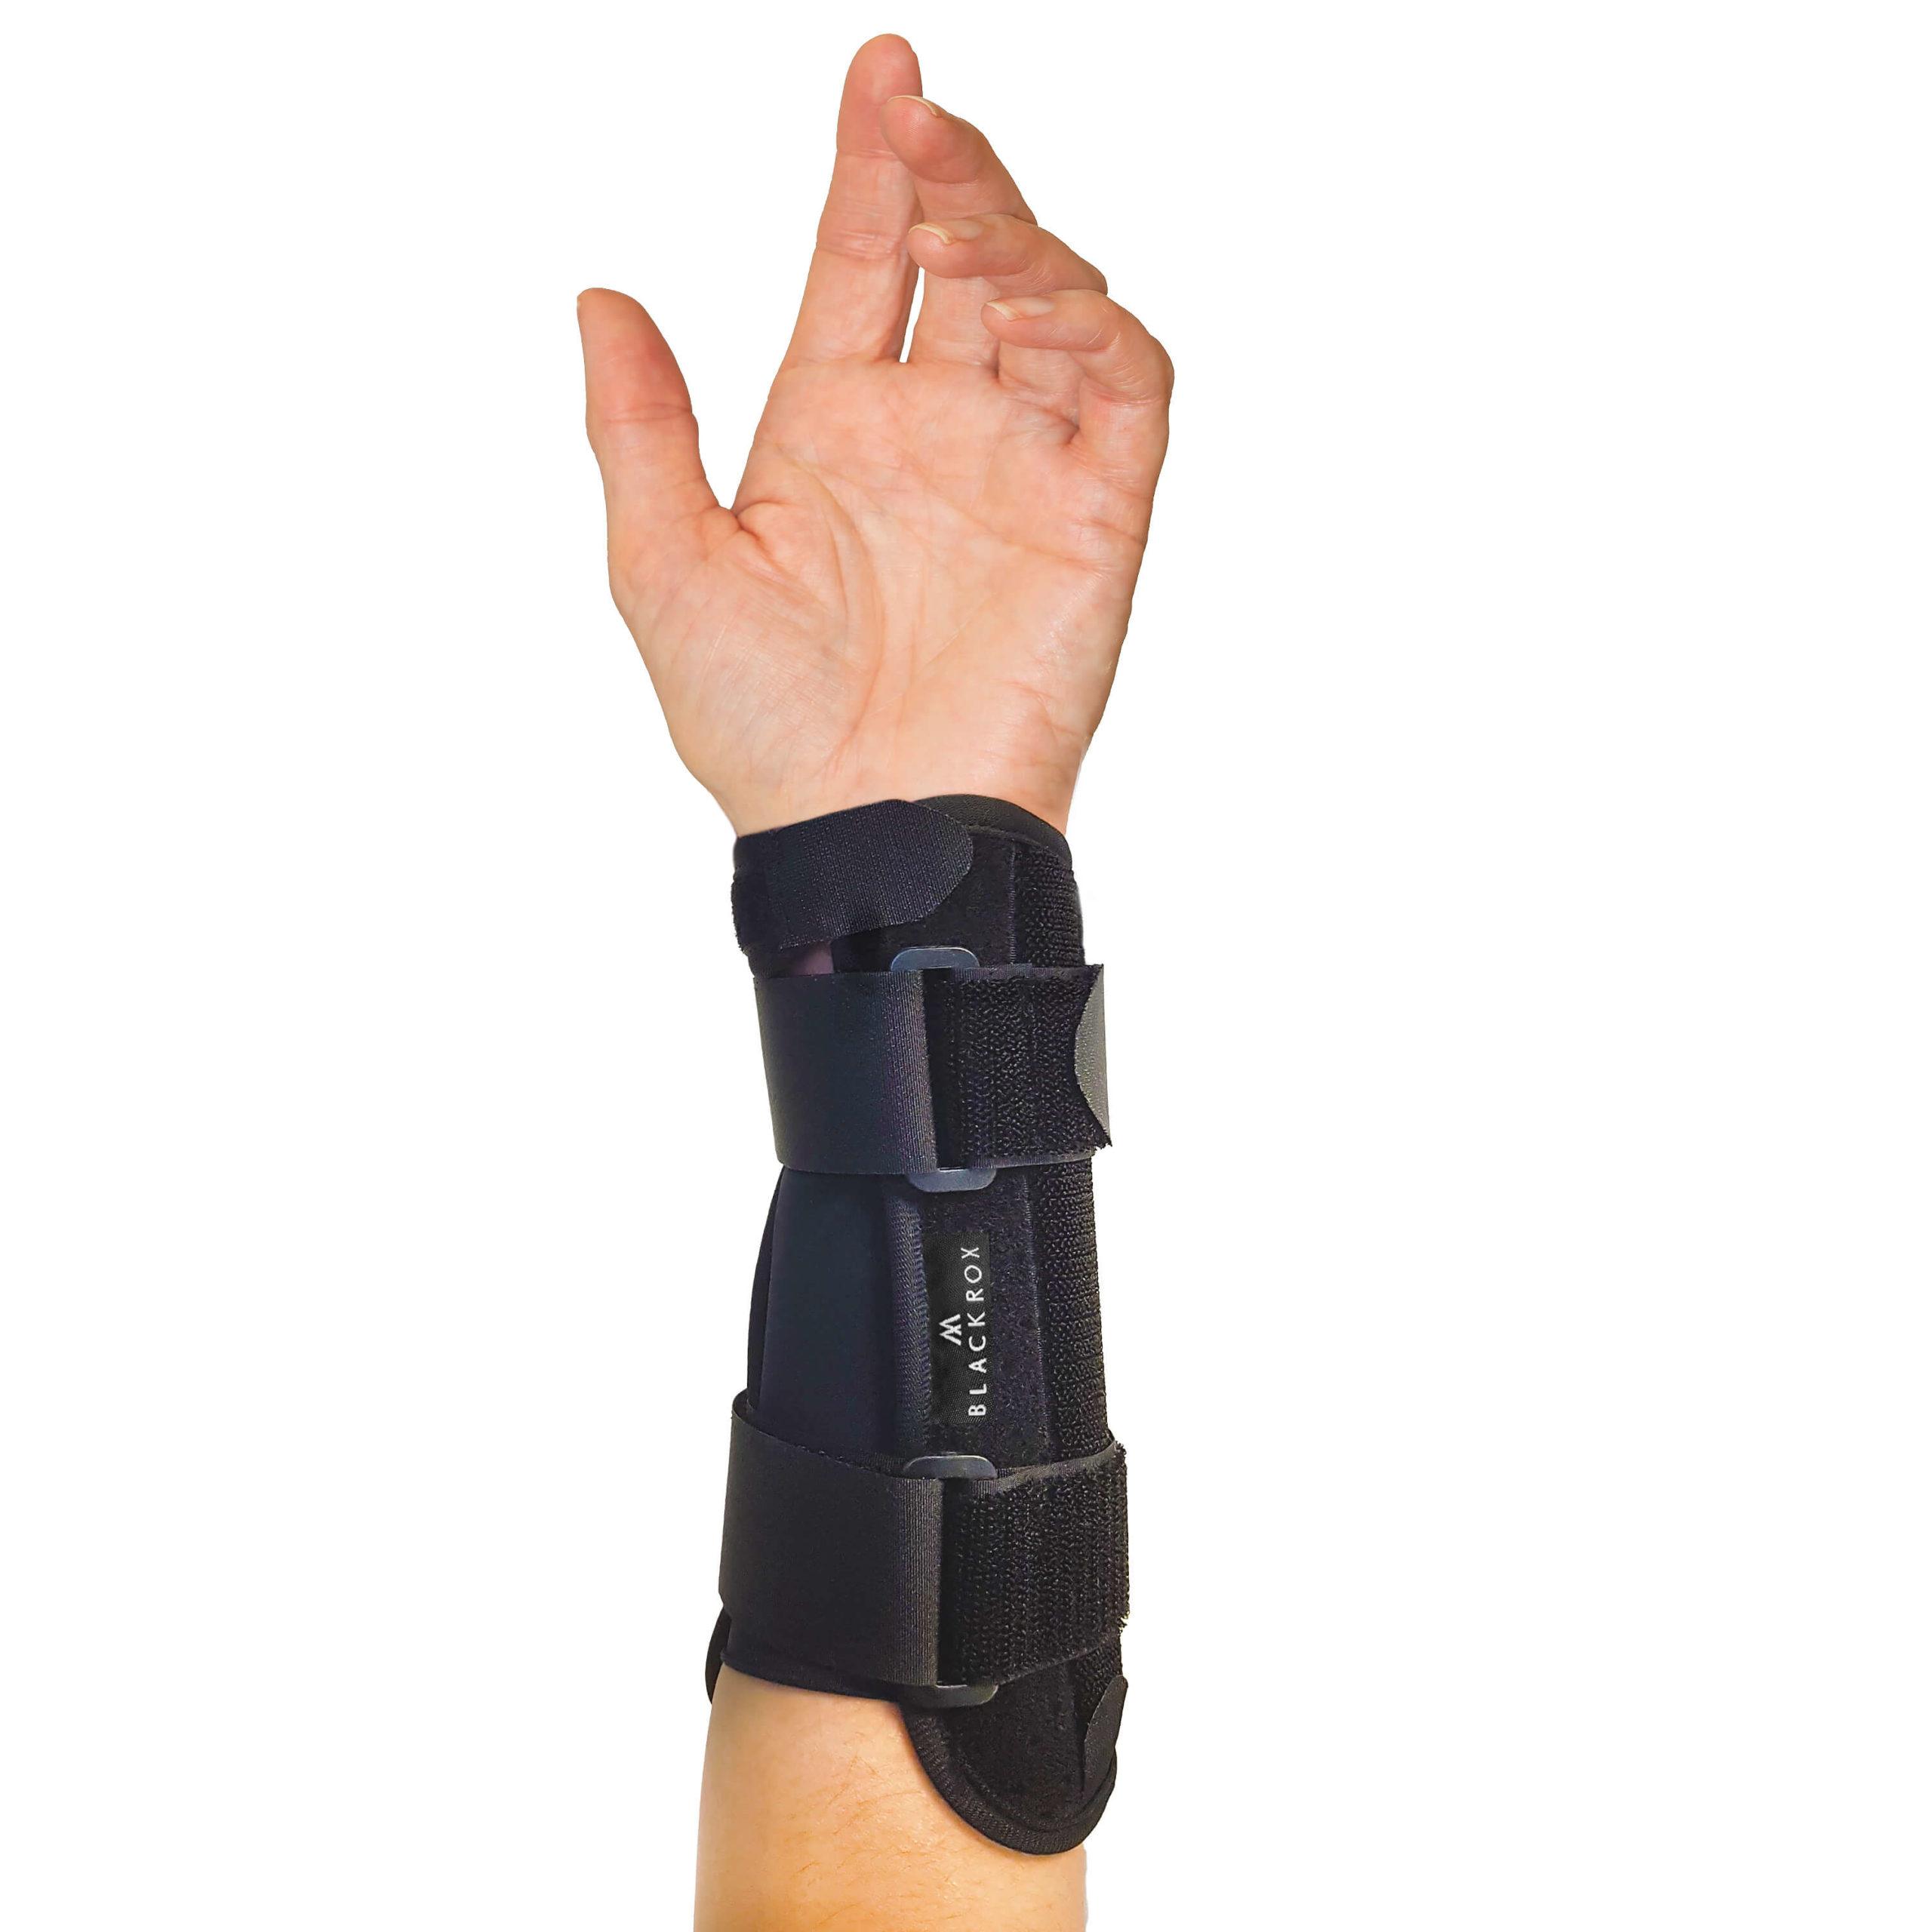 Blackrox_Hand_Bandage-start3